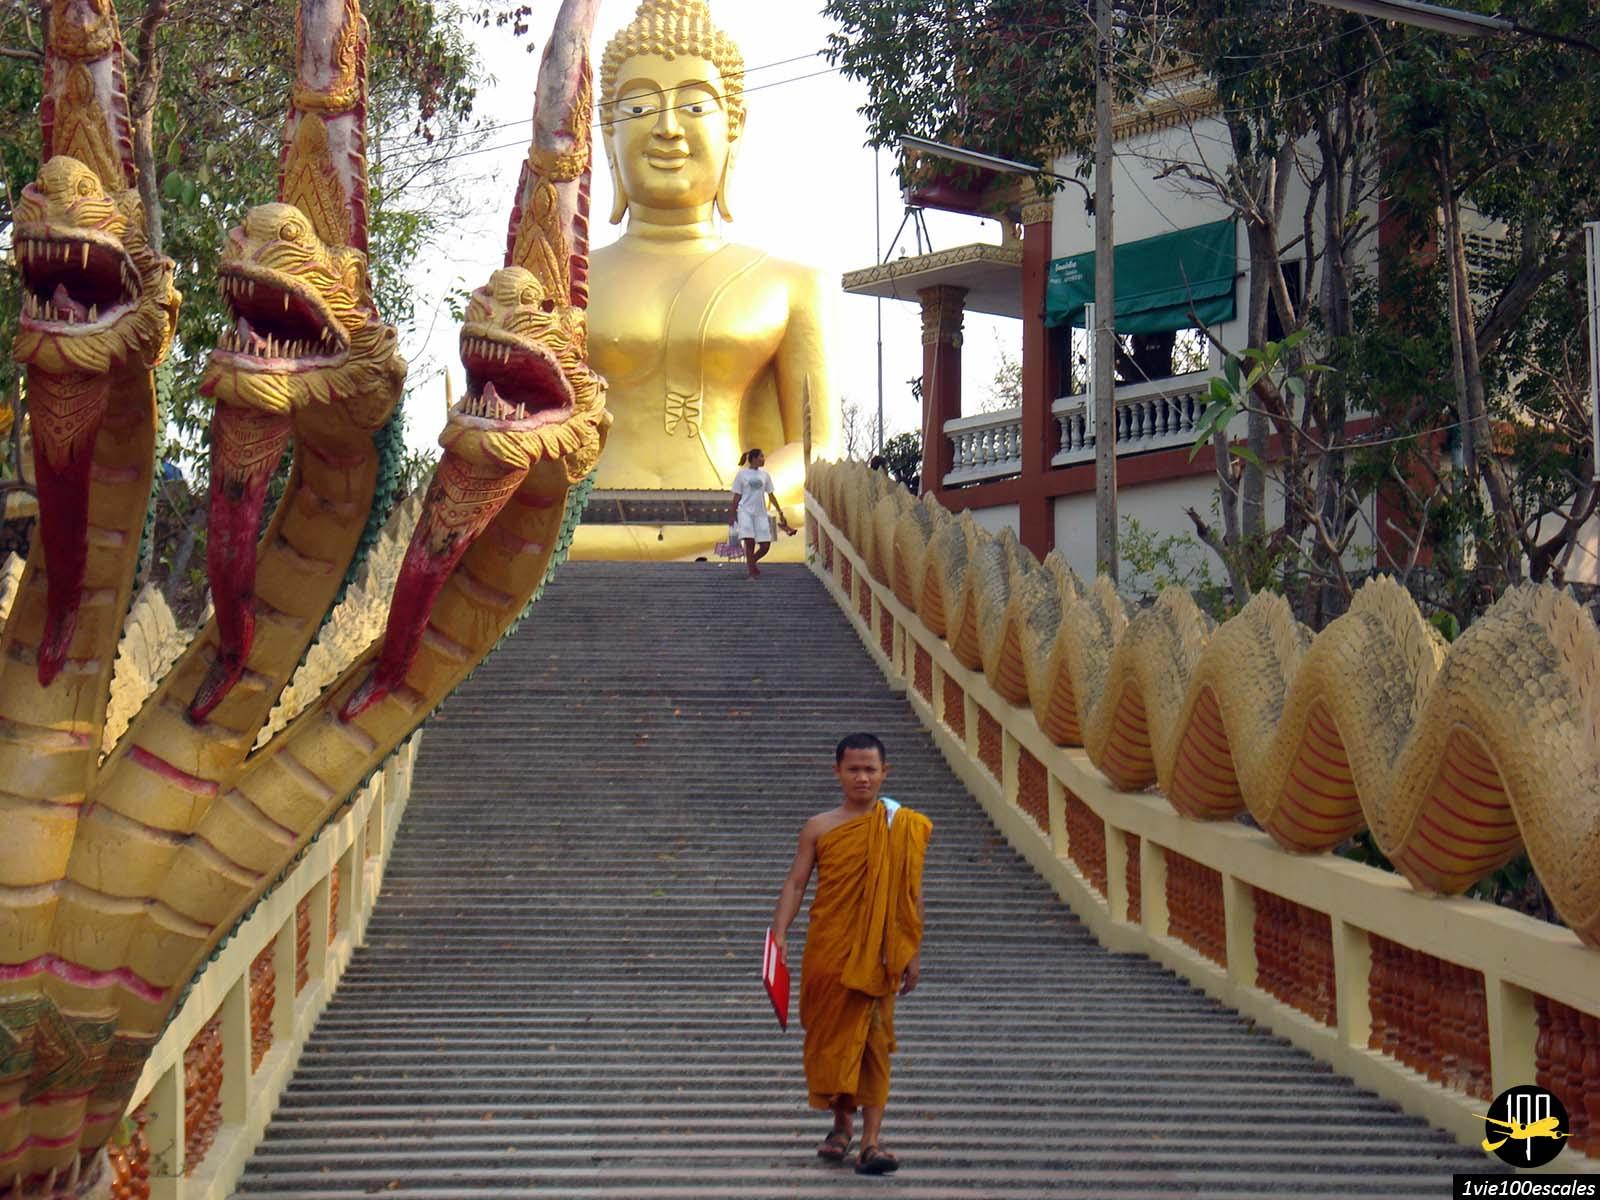 Escale #008 Pattaya